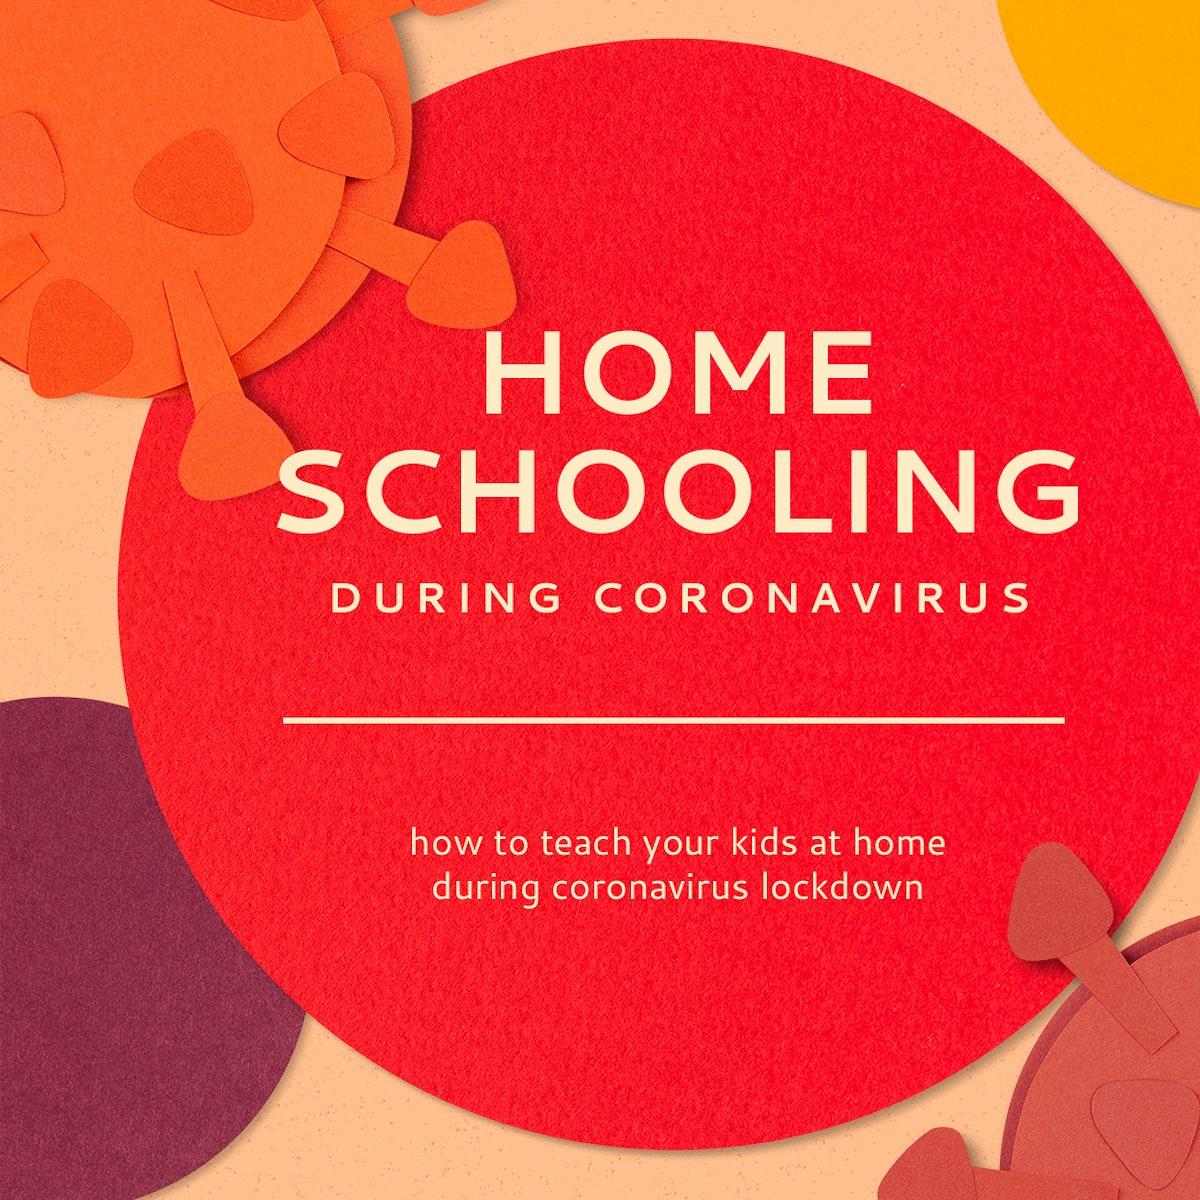 Homeschooling during coronavirus pandemic social banner template mockup